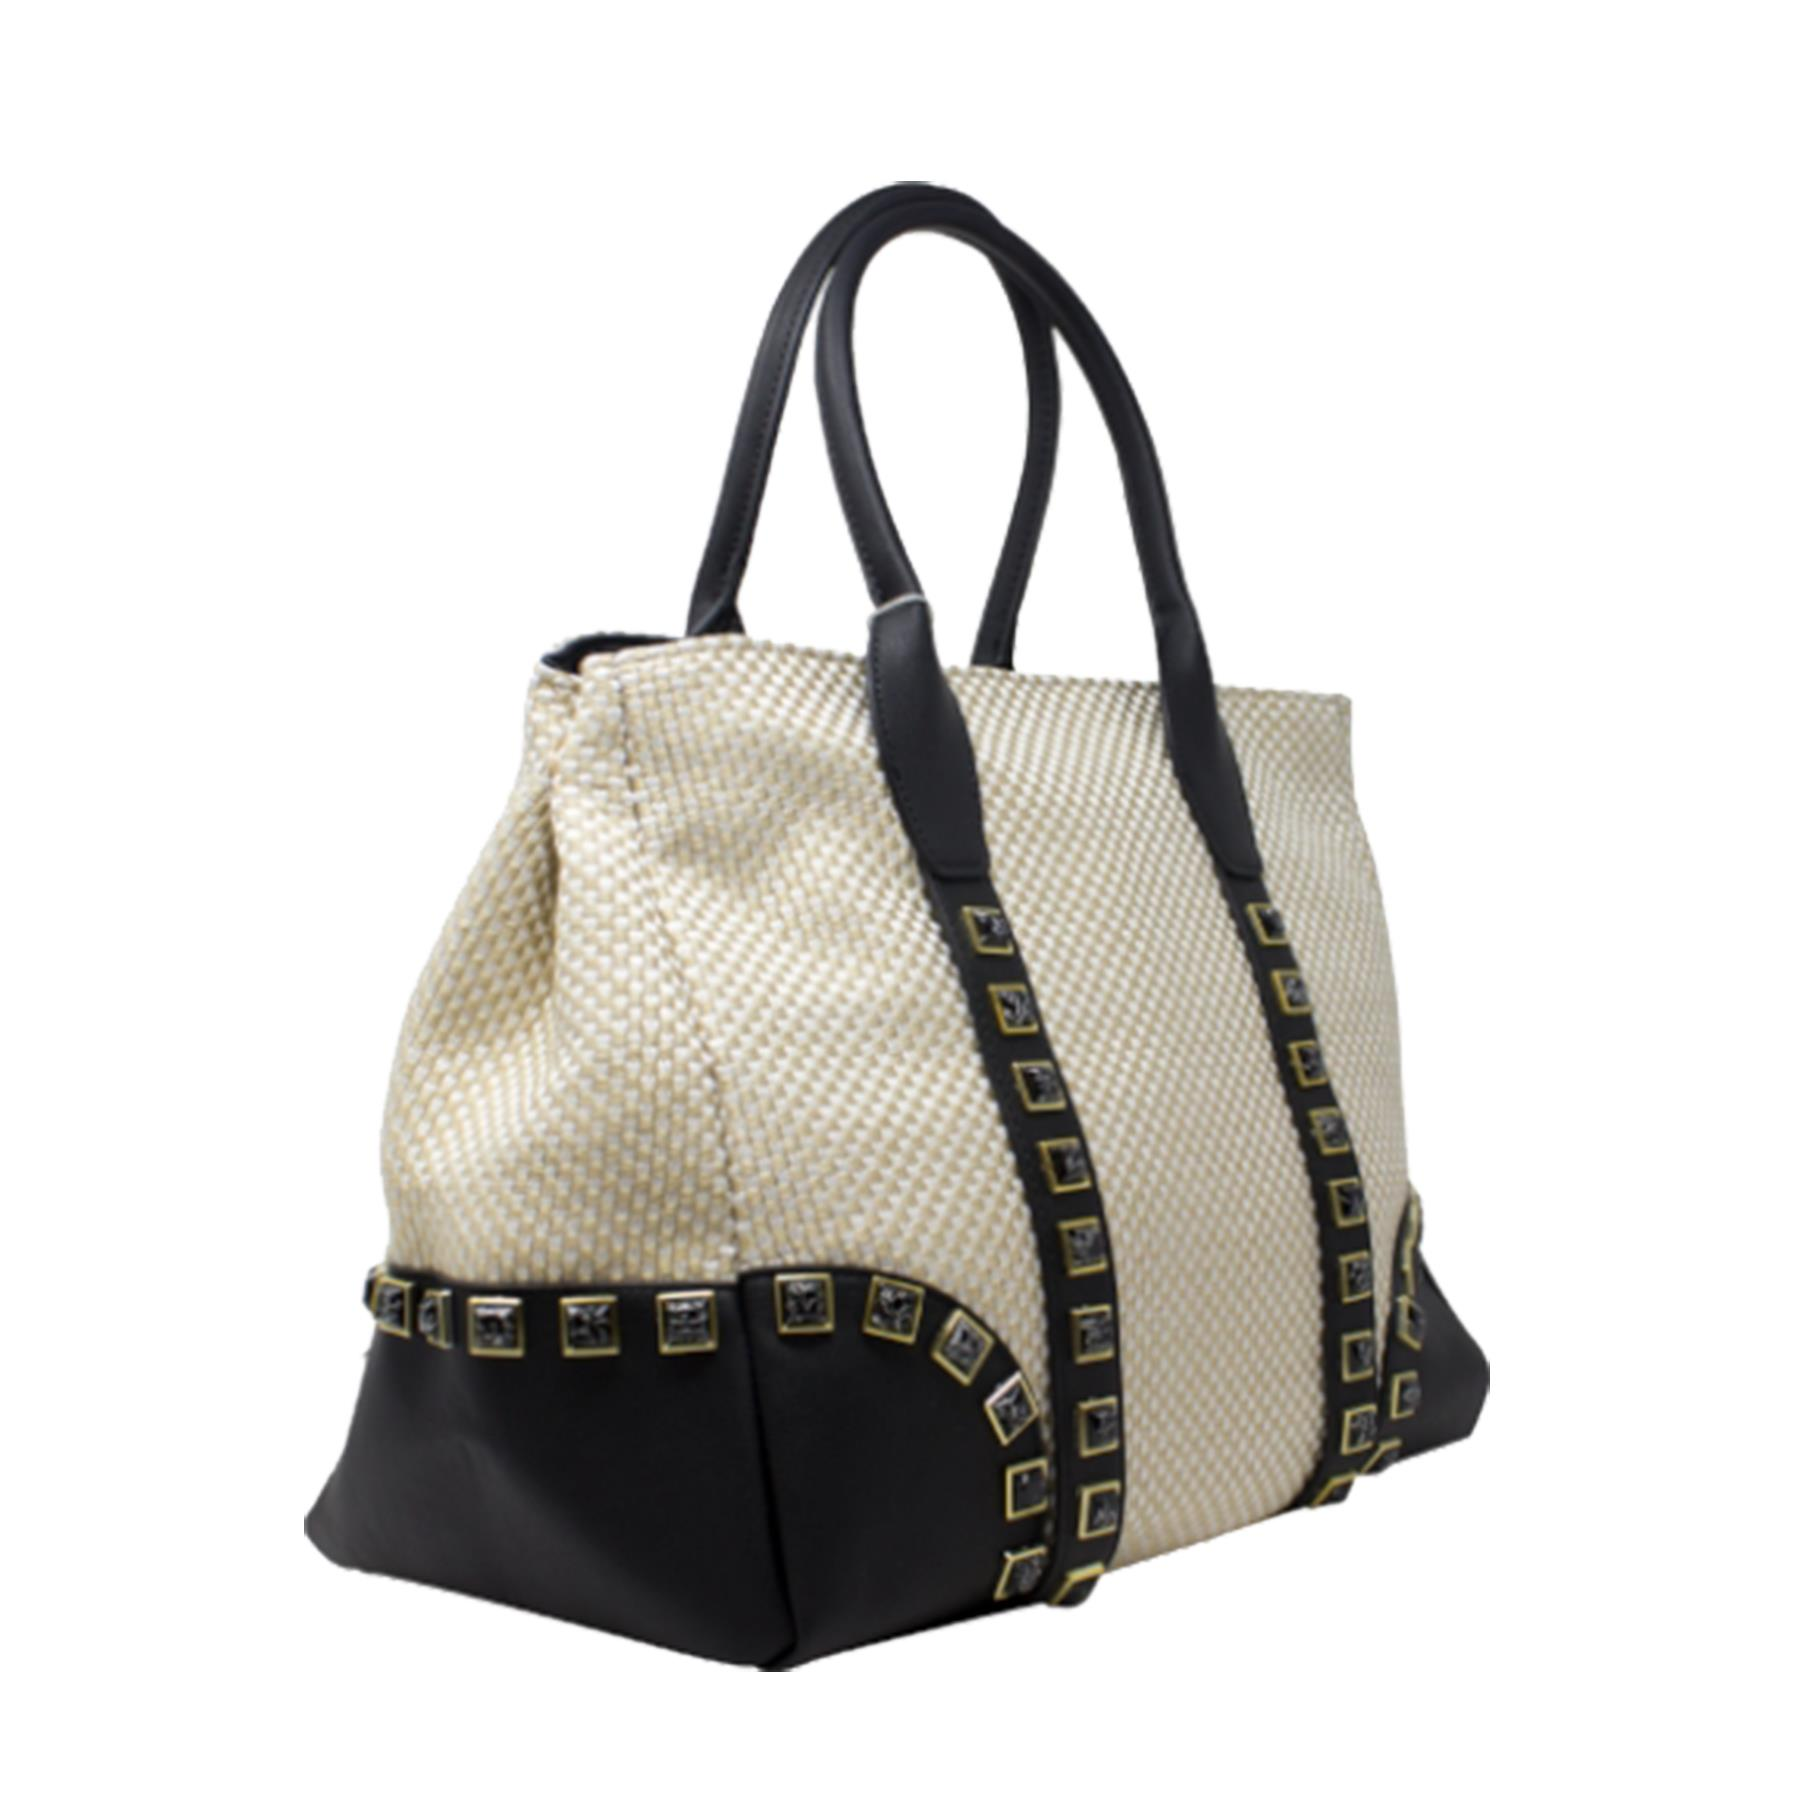 New-Women-s-Small-Check-Pattern-Studded-Design-Tote-Bag-Handbag thumbnail 15